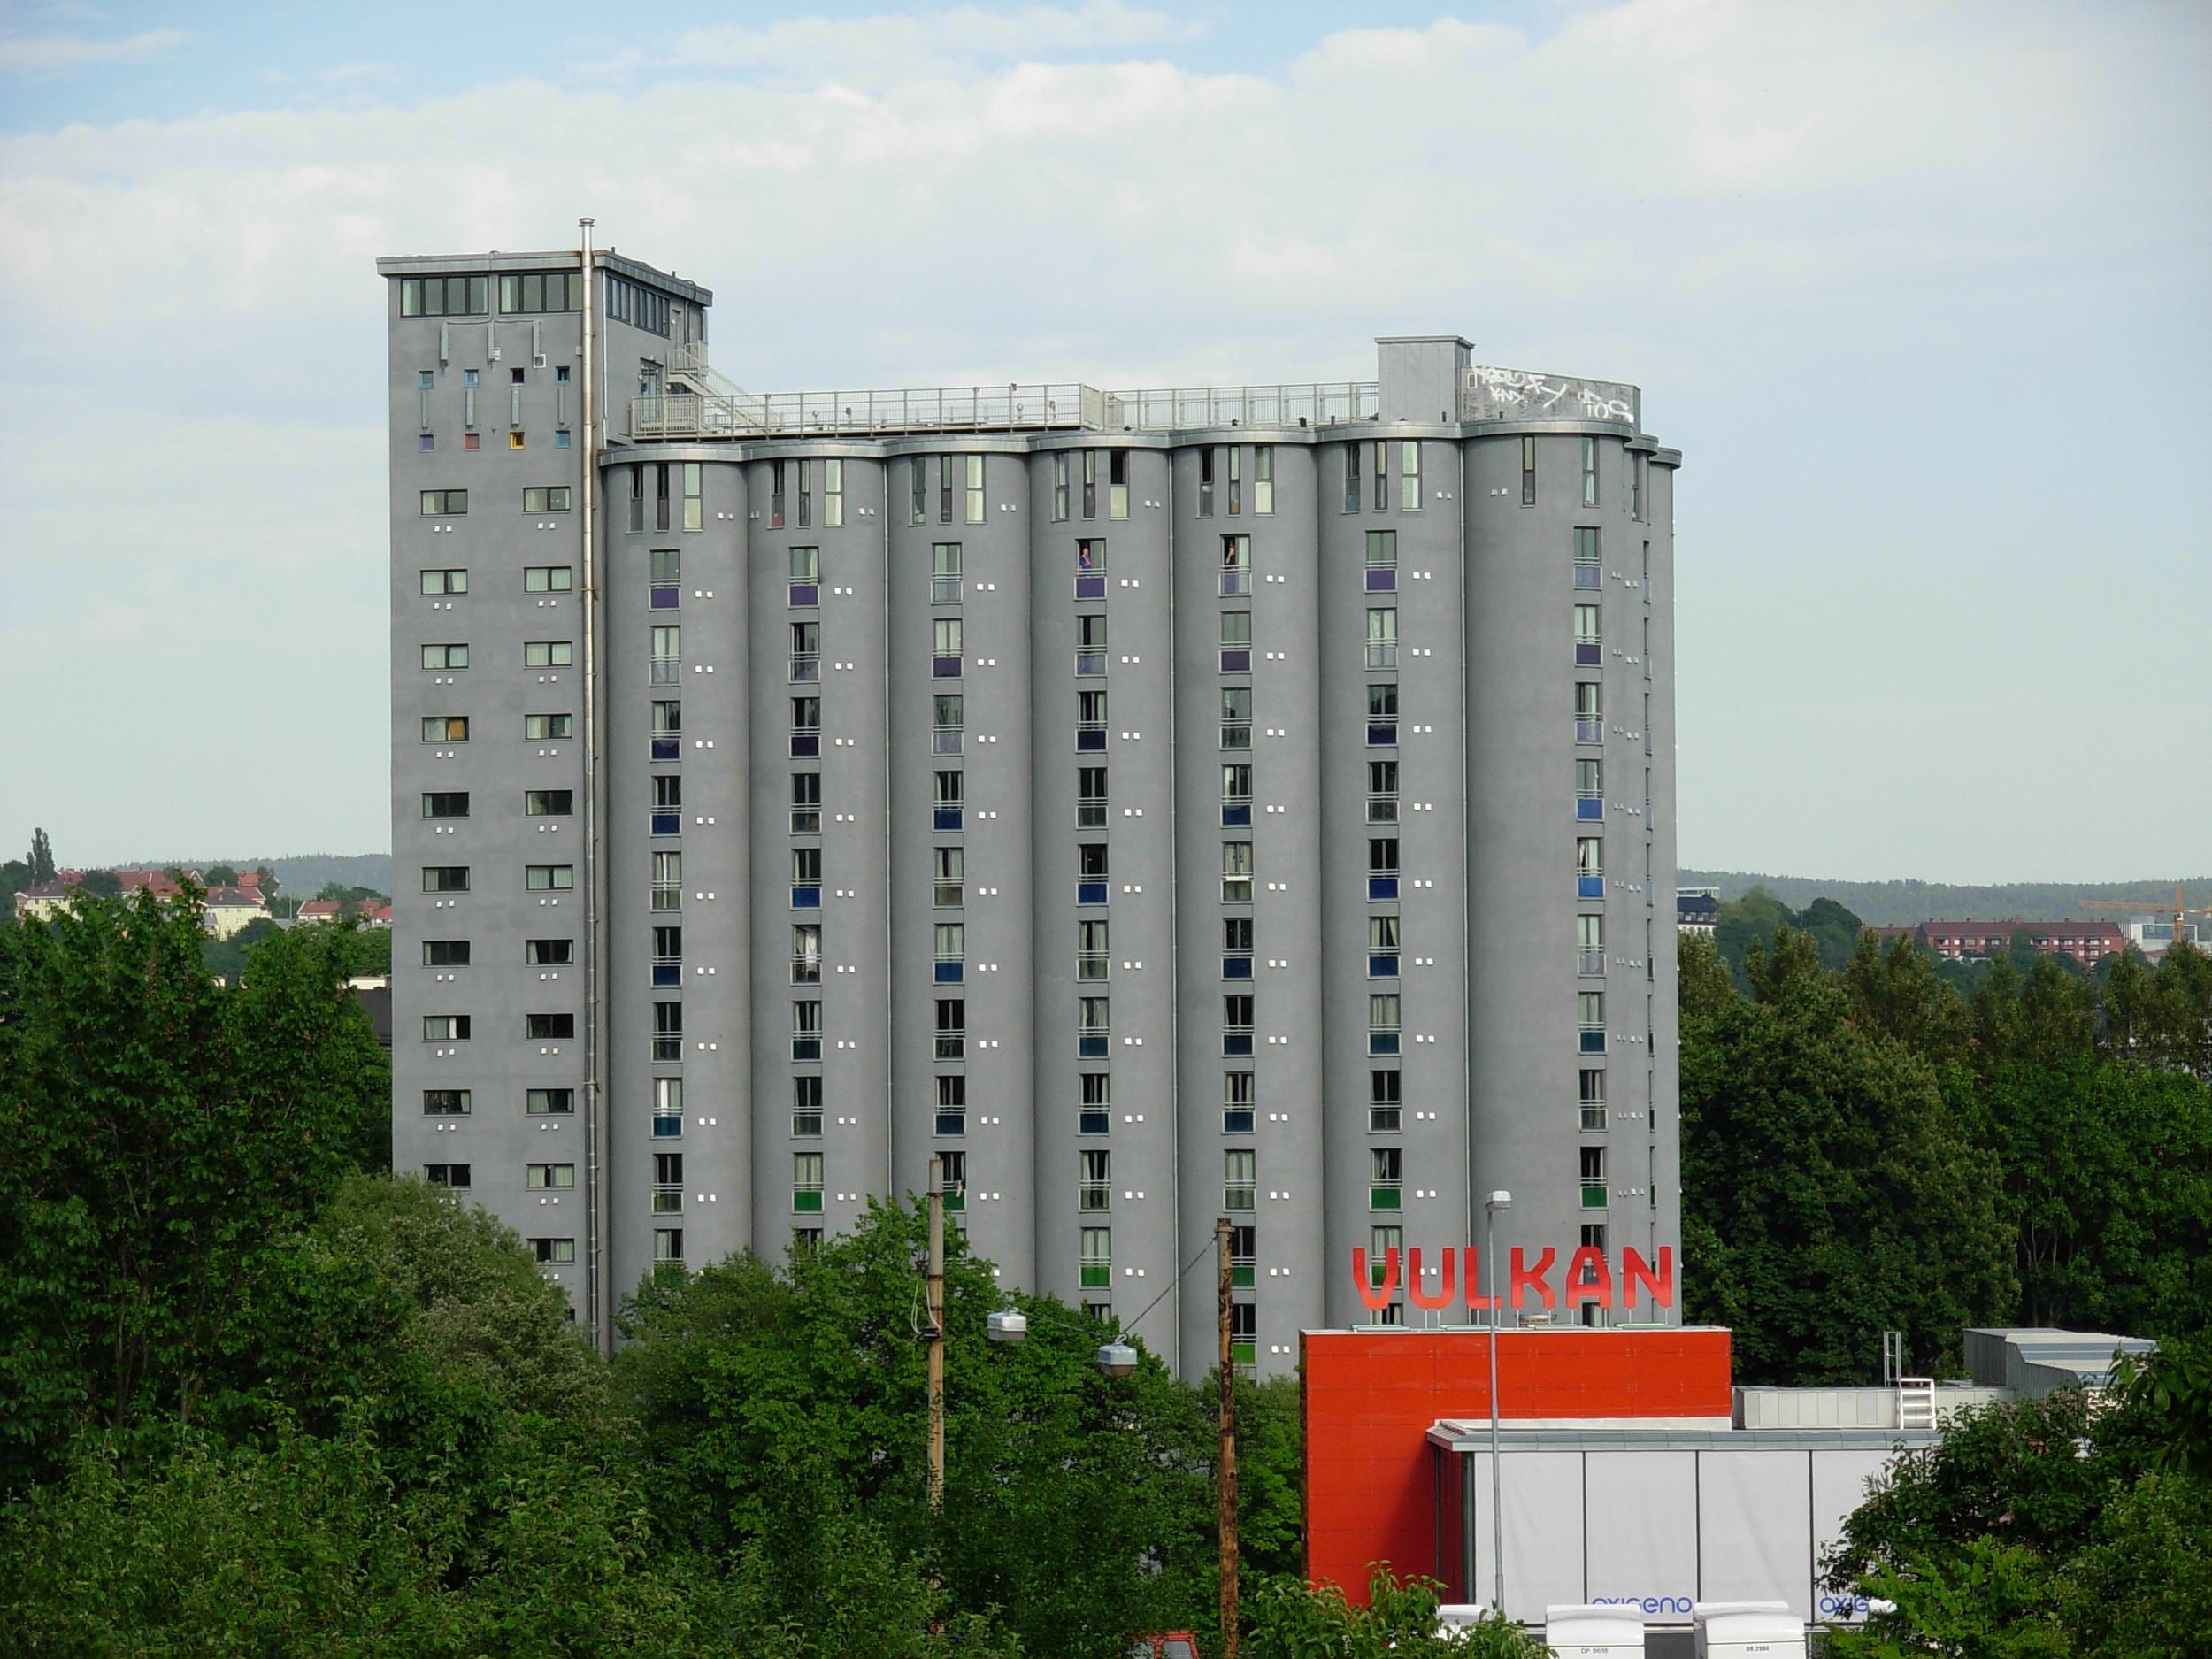 Grünerløkka studenthus er en gammel silo som har blitt omgjorttil studentboliger  foto: Helge HøifødtCC BY 3.0 via Wikimedia